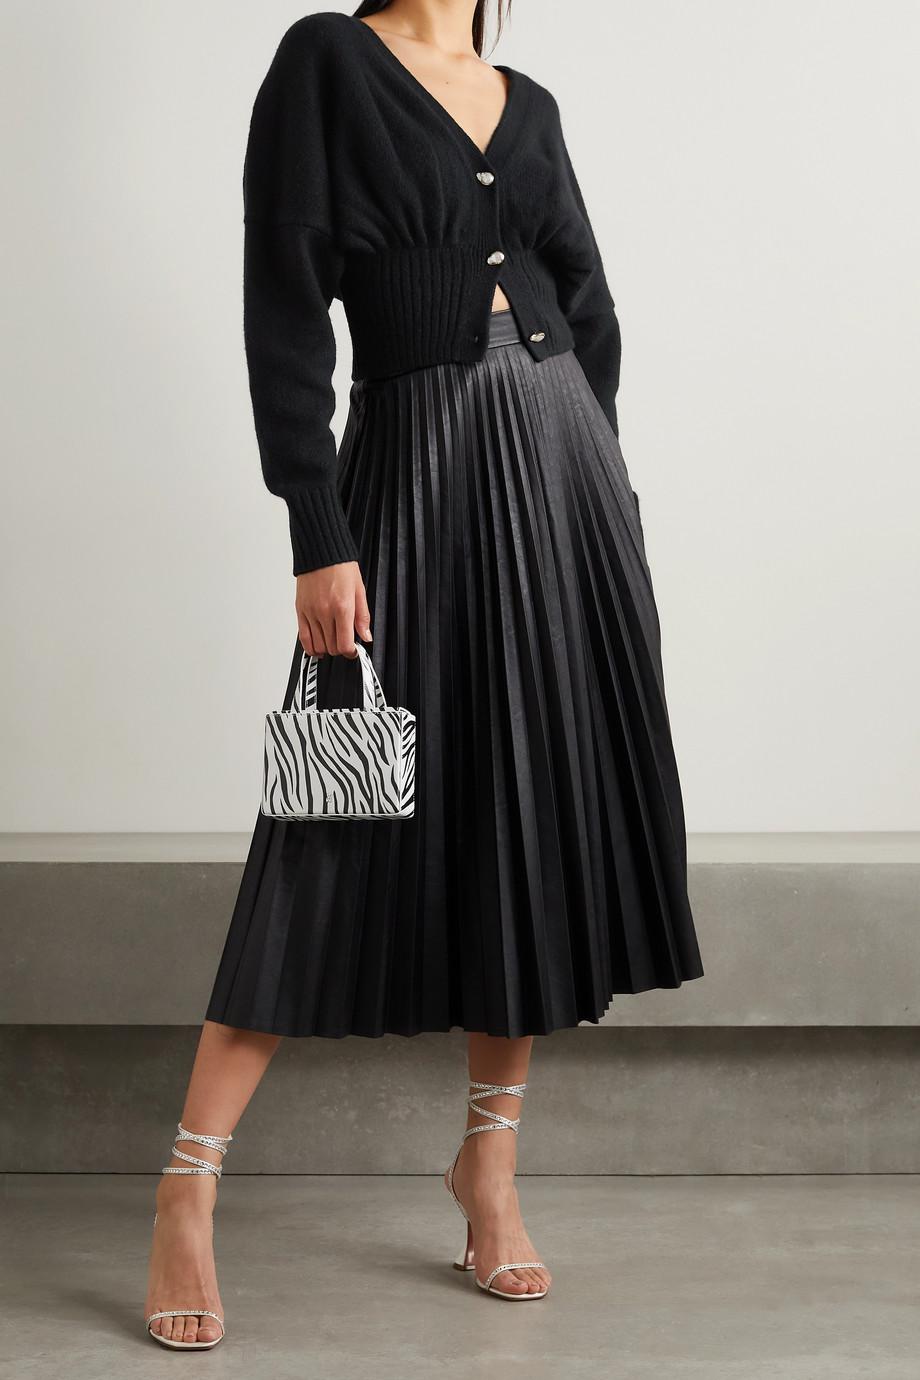 Galvan Luna cropped wool-blend cardigan